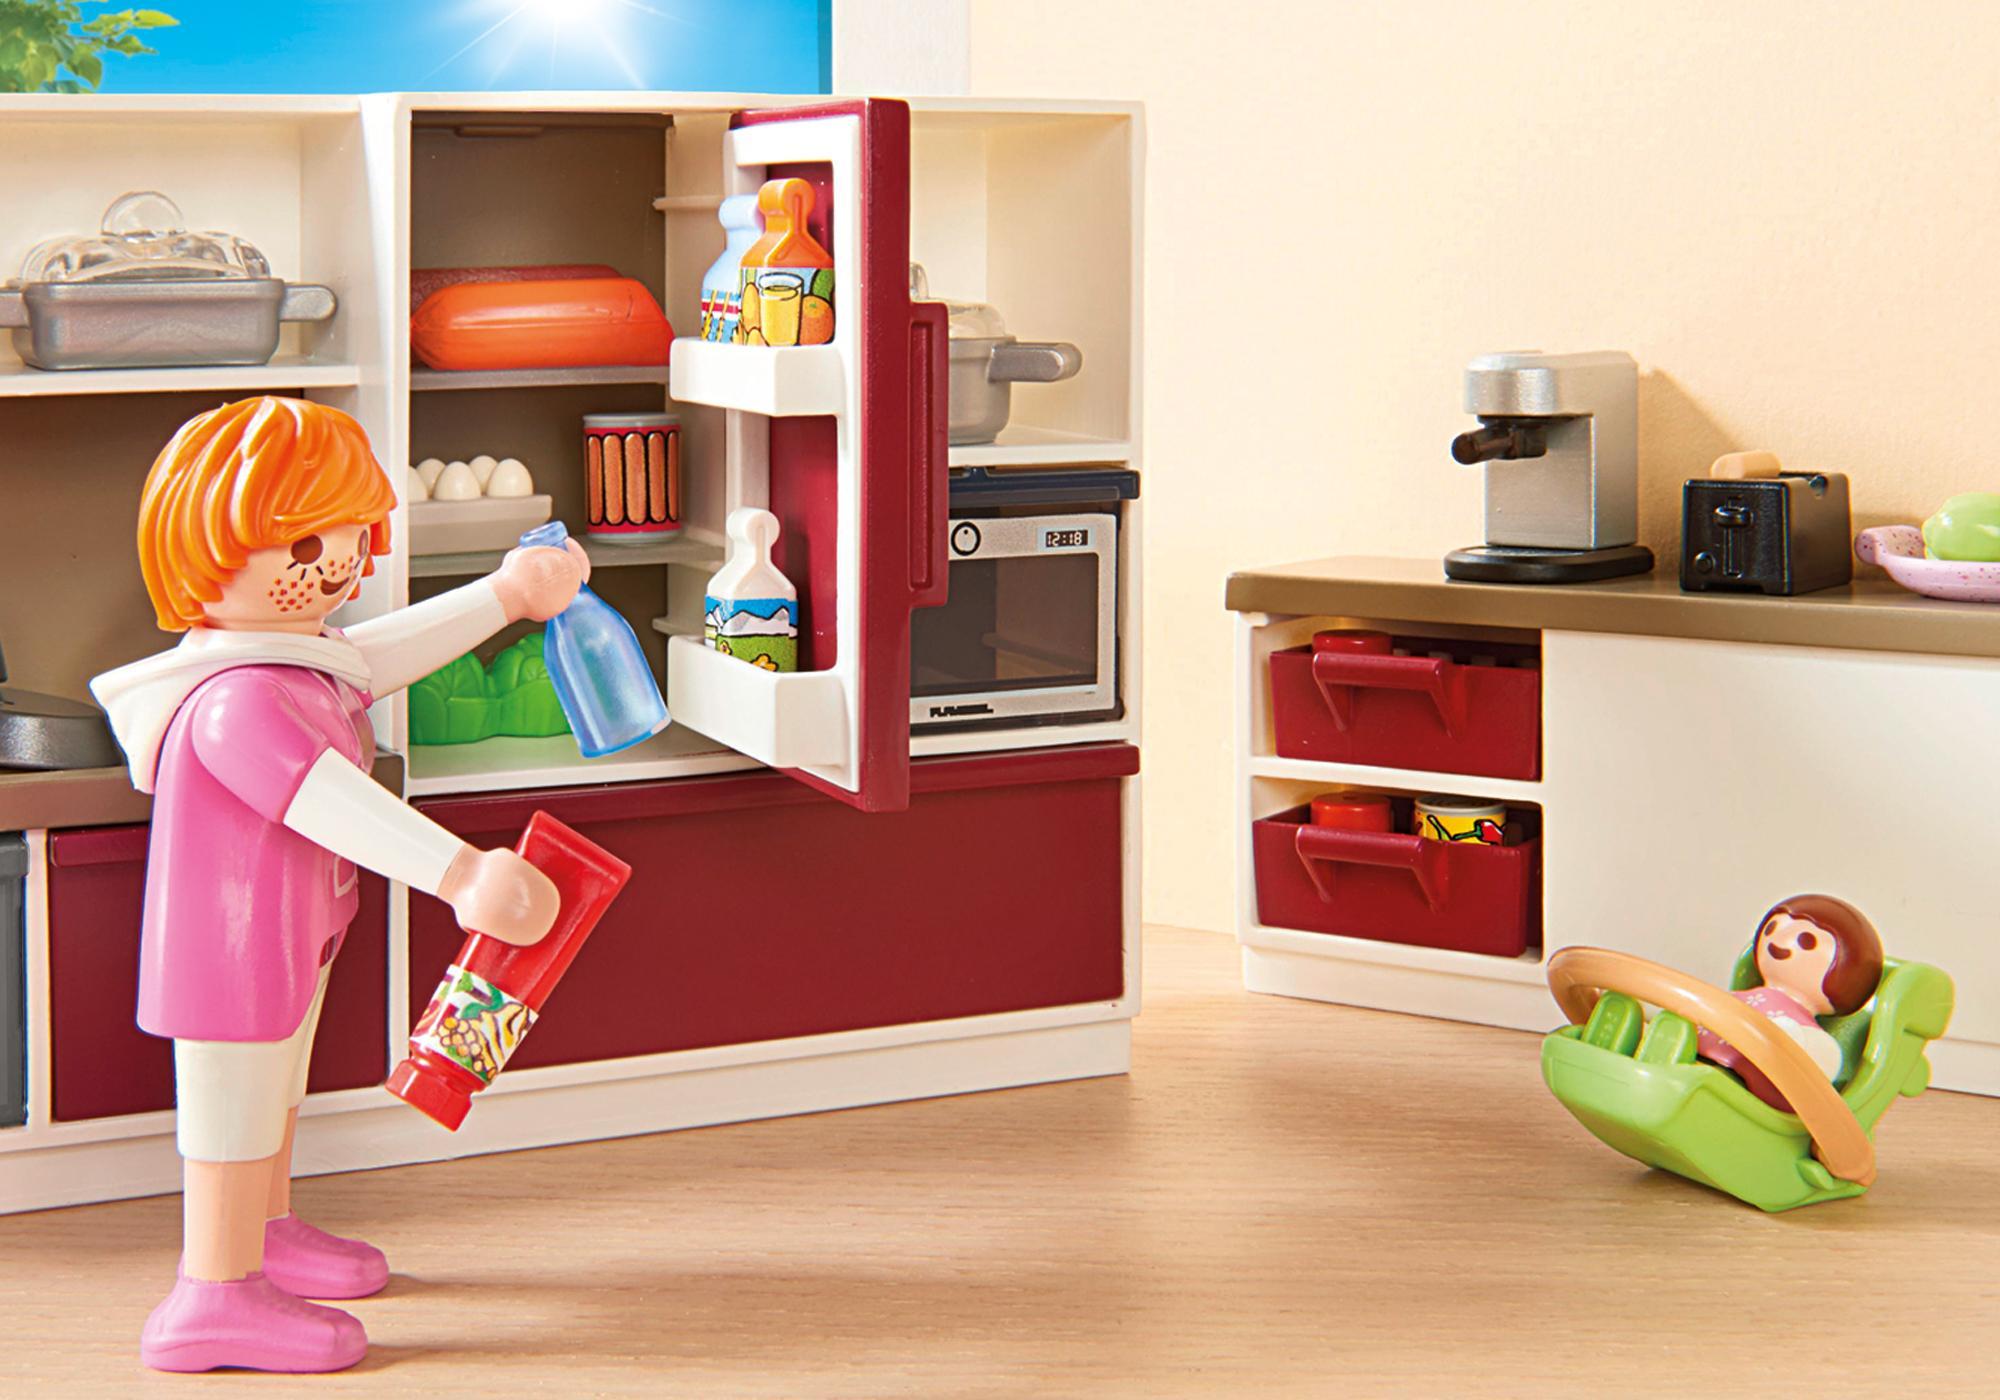 http://media.playmobil.com/i/playmobil/9269_product_extra3/Grande cucina attrezzata